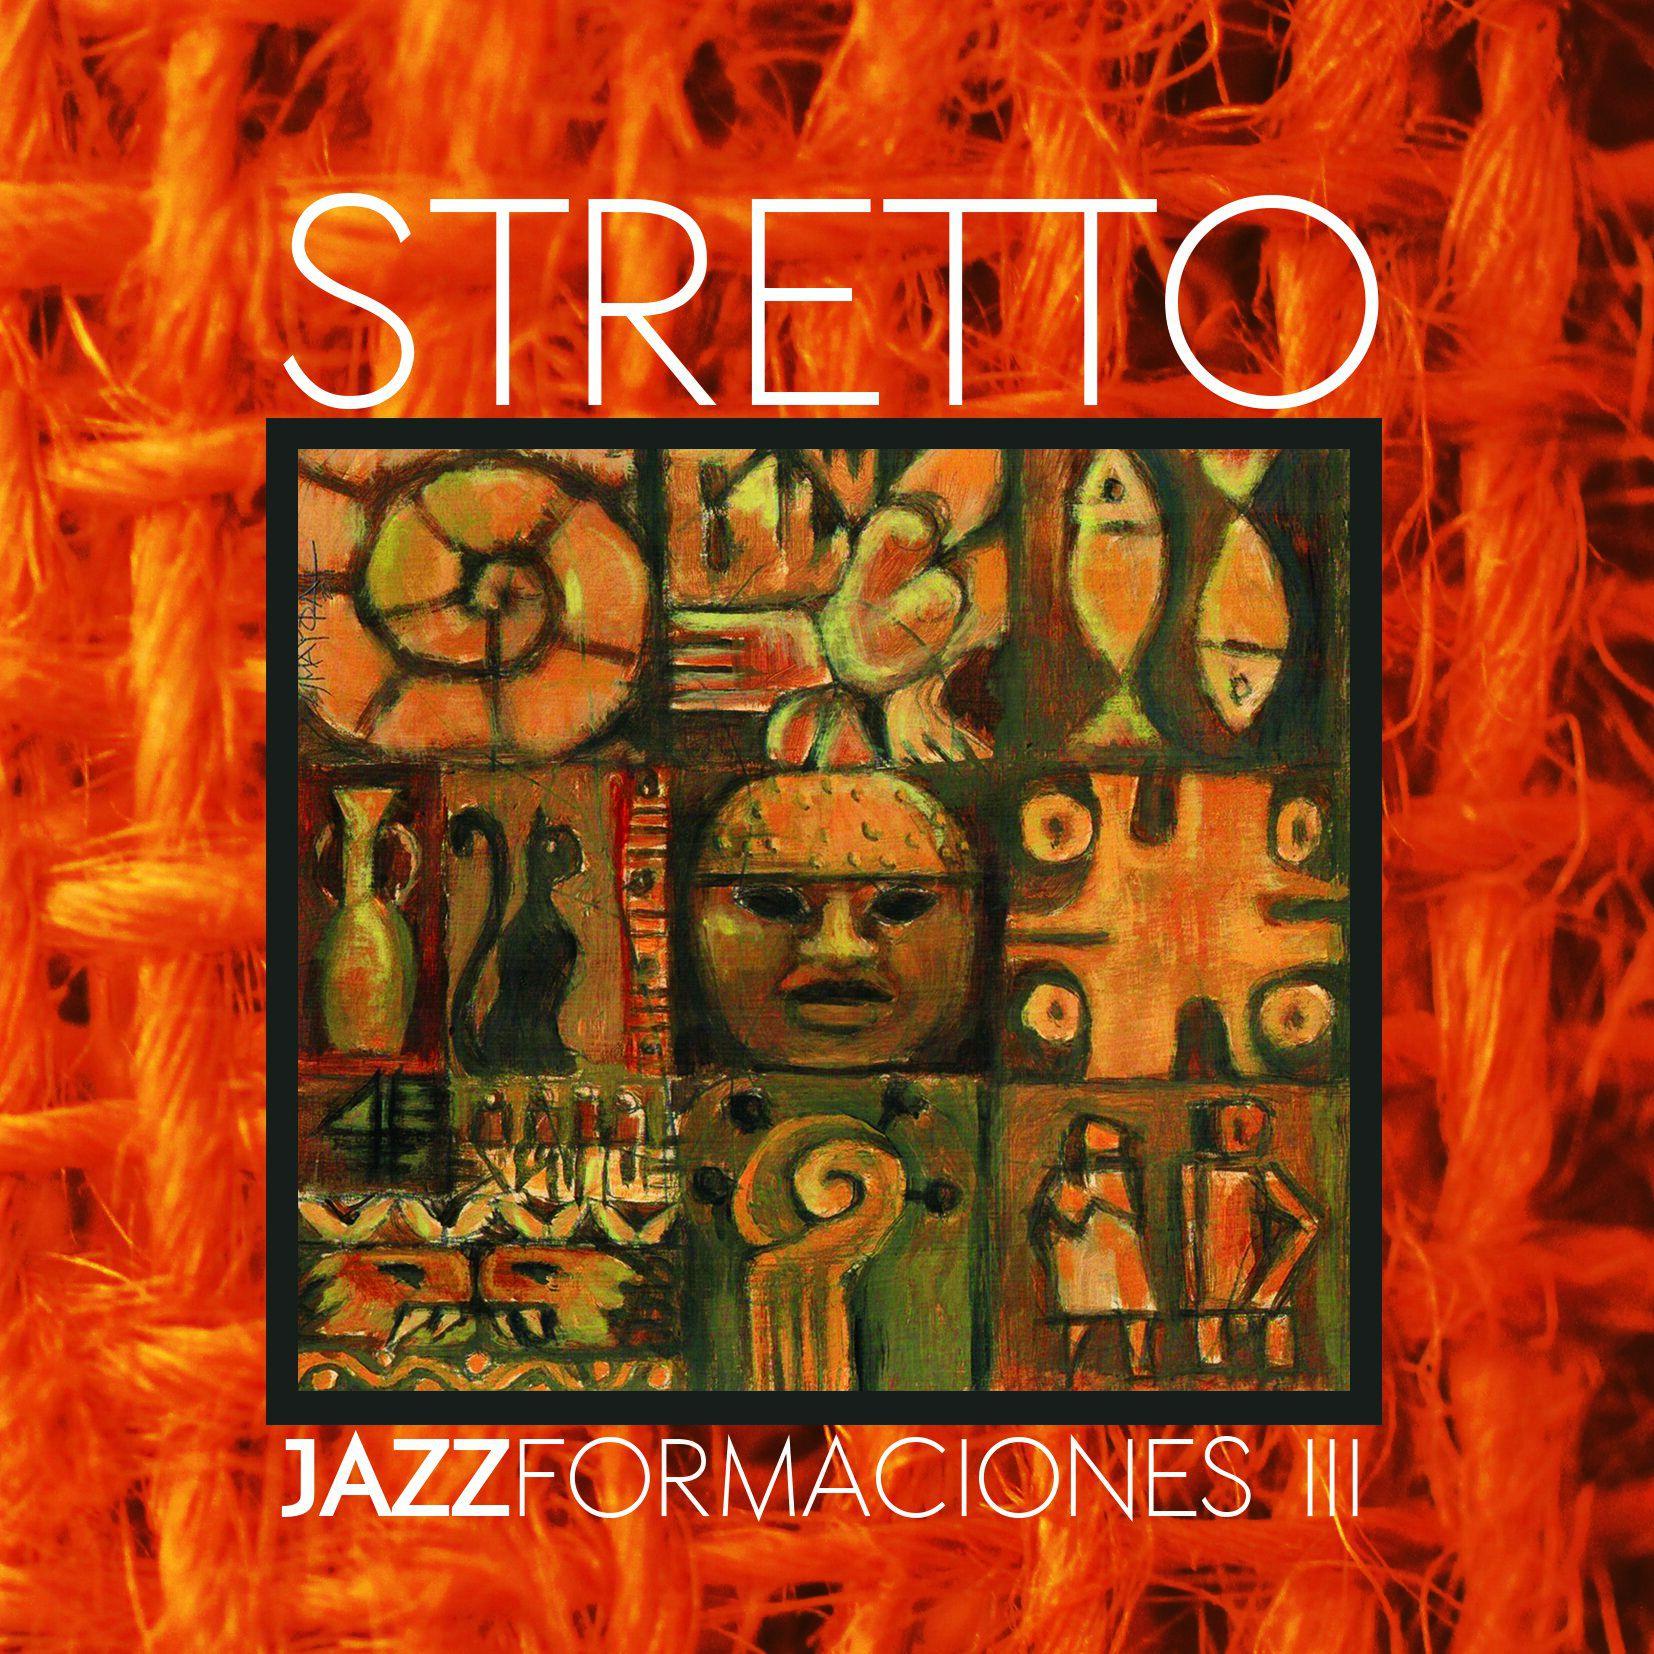 Stretto / Erik Escobar -  Latin American Series